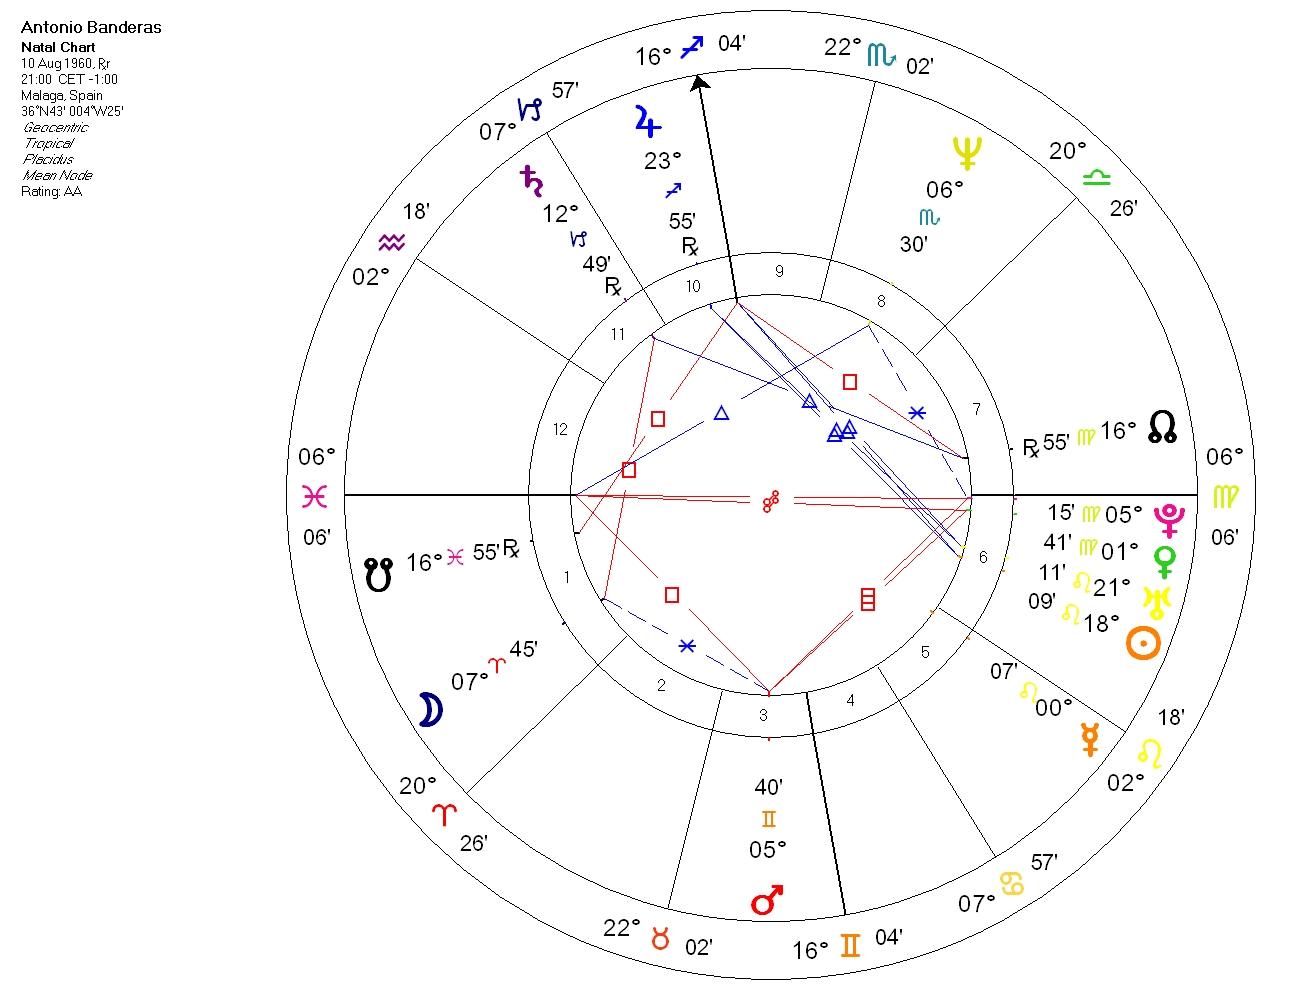 Antonio Banderas - horoskop urodzeniowy